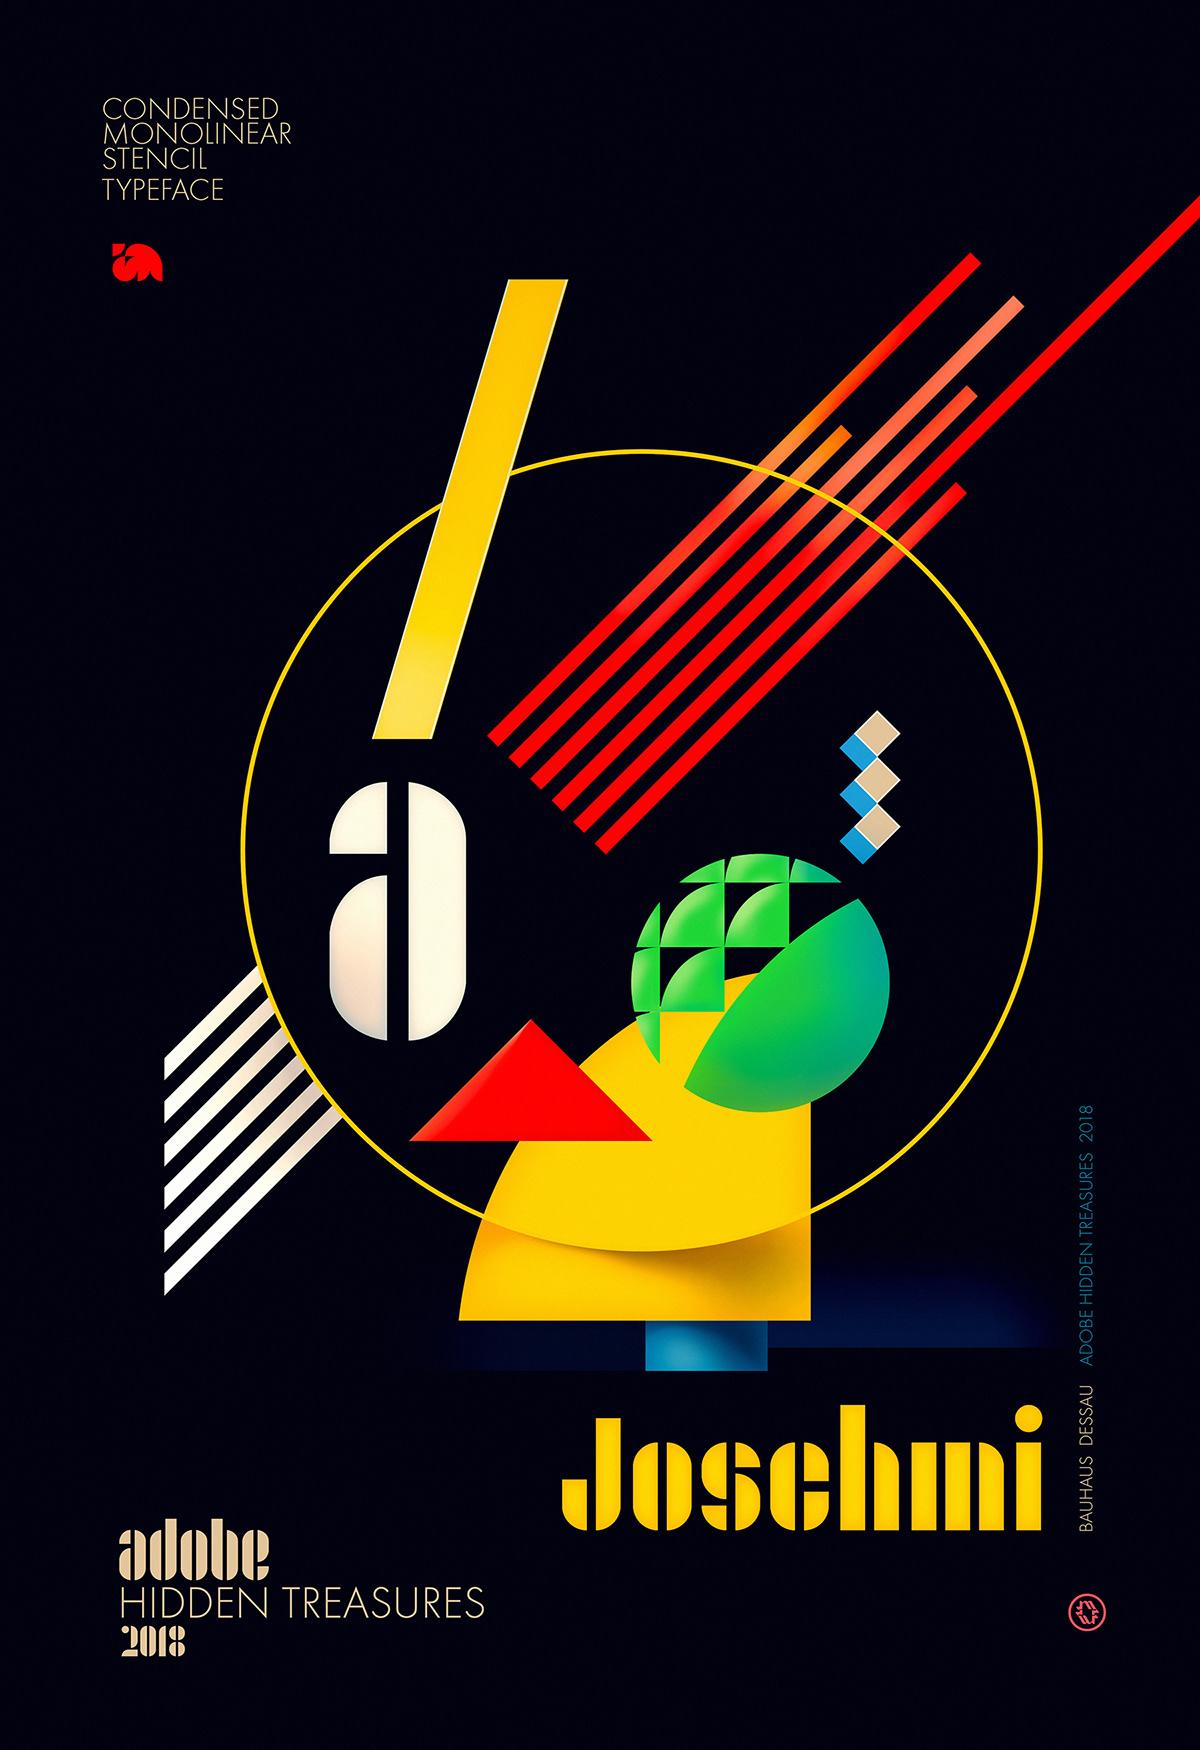 AdobeHiddenTreasures contest bauhaus ILLUSTRATION  wflemming color posters bauhaus 100 modernism